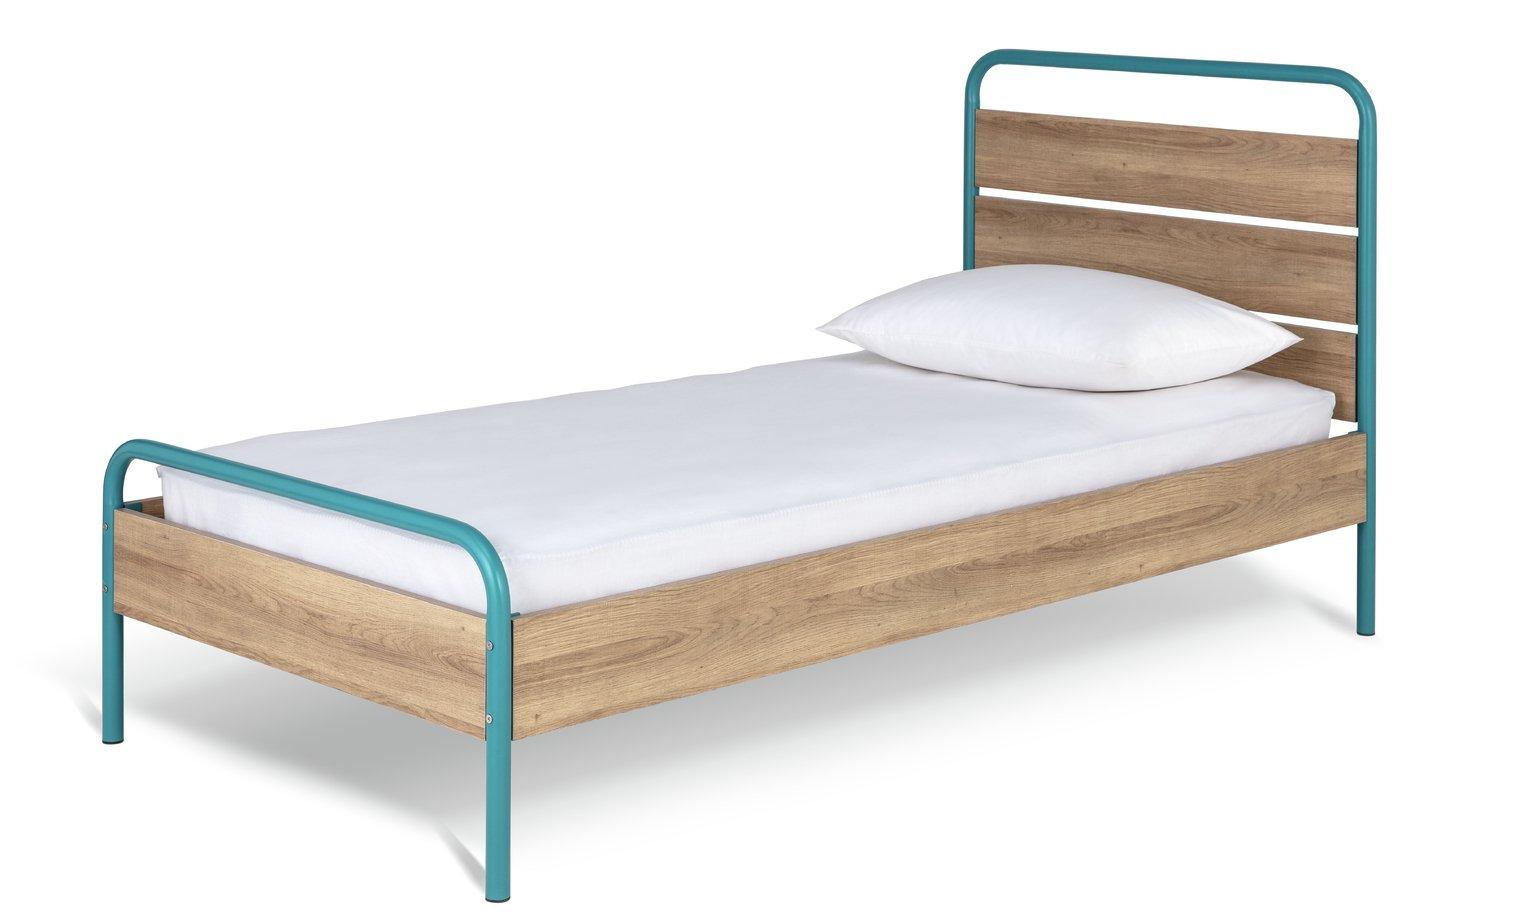 Habitat Industrial Single Bed and Kids Mattress -Dark Oak